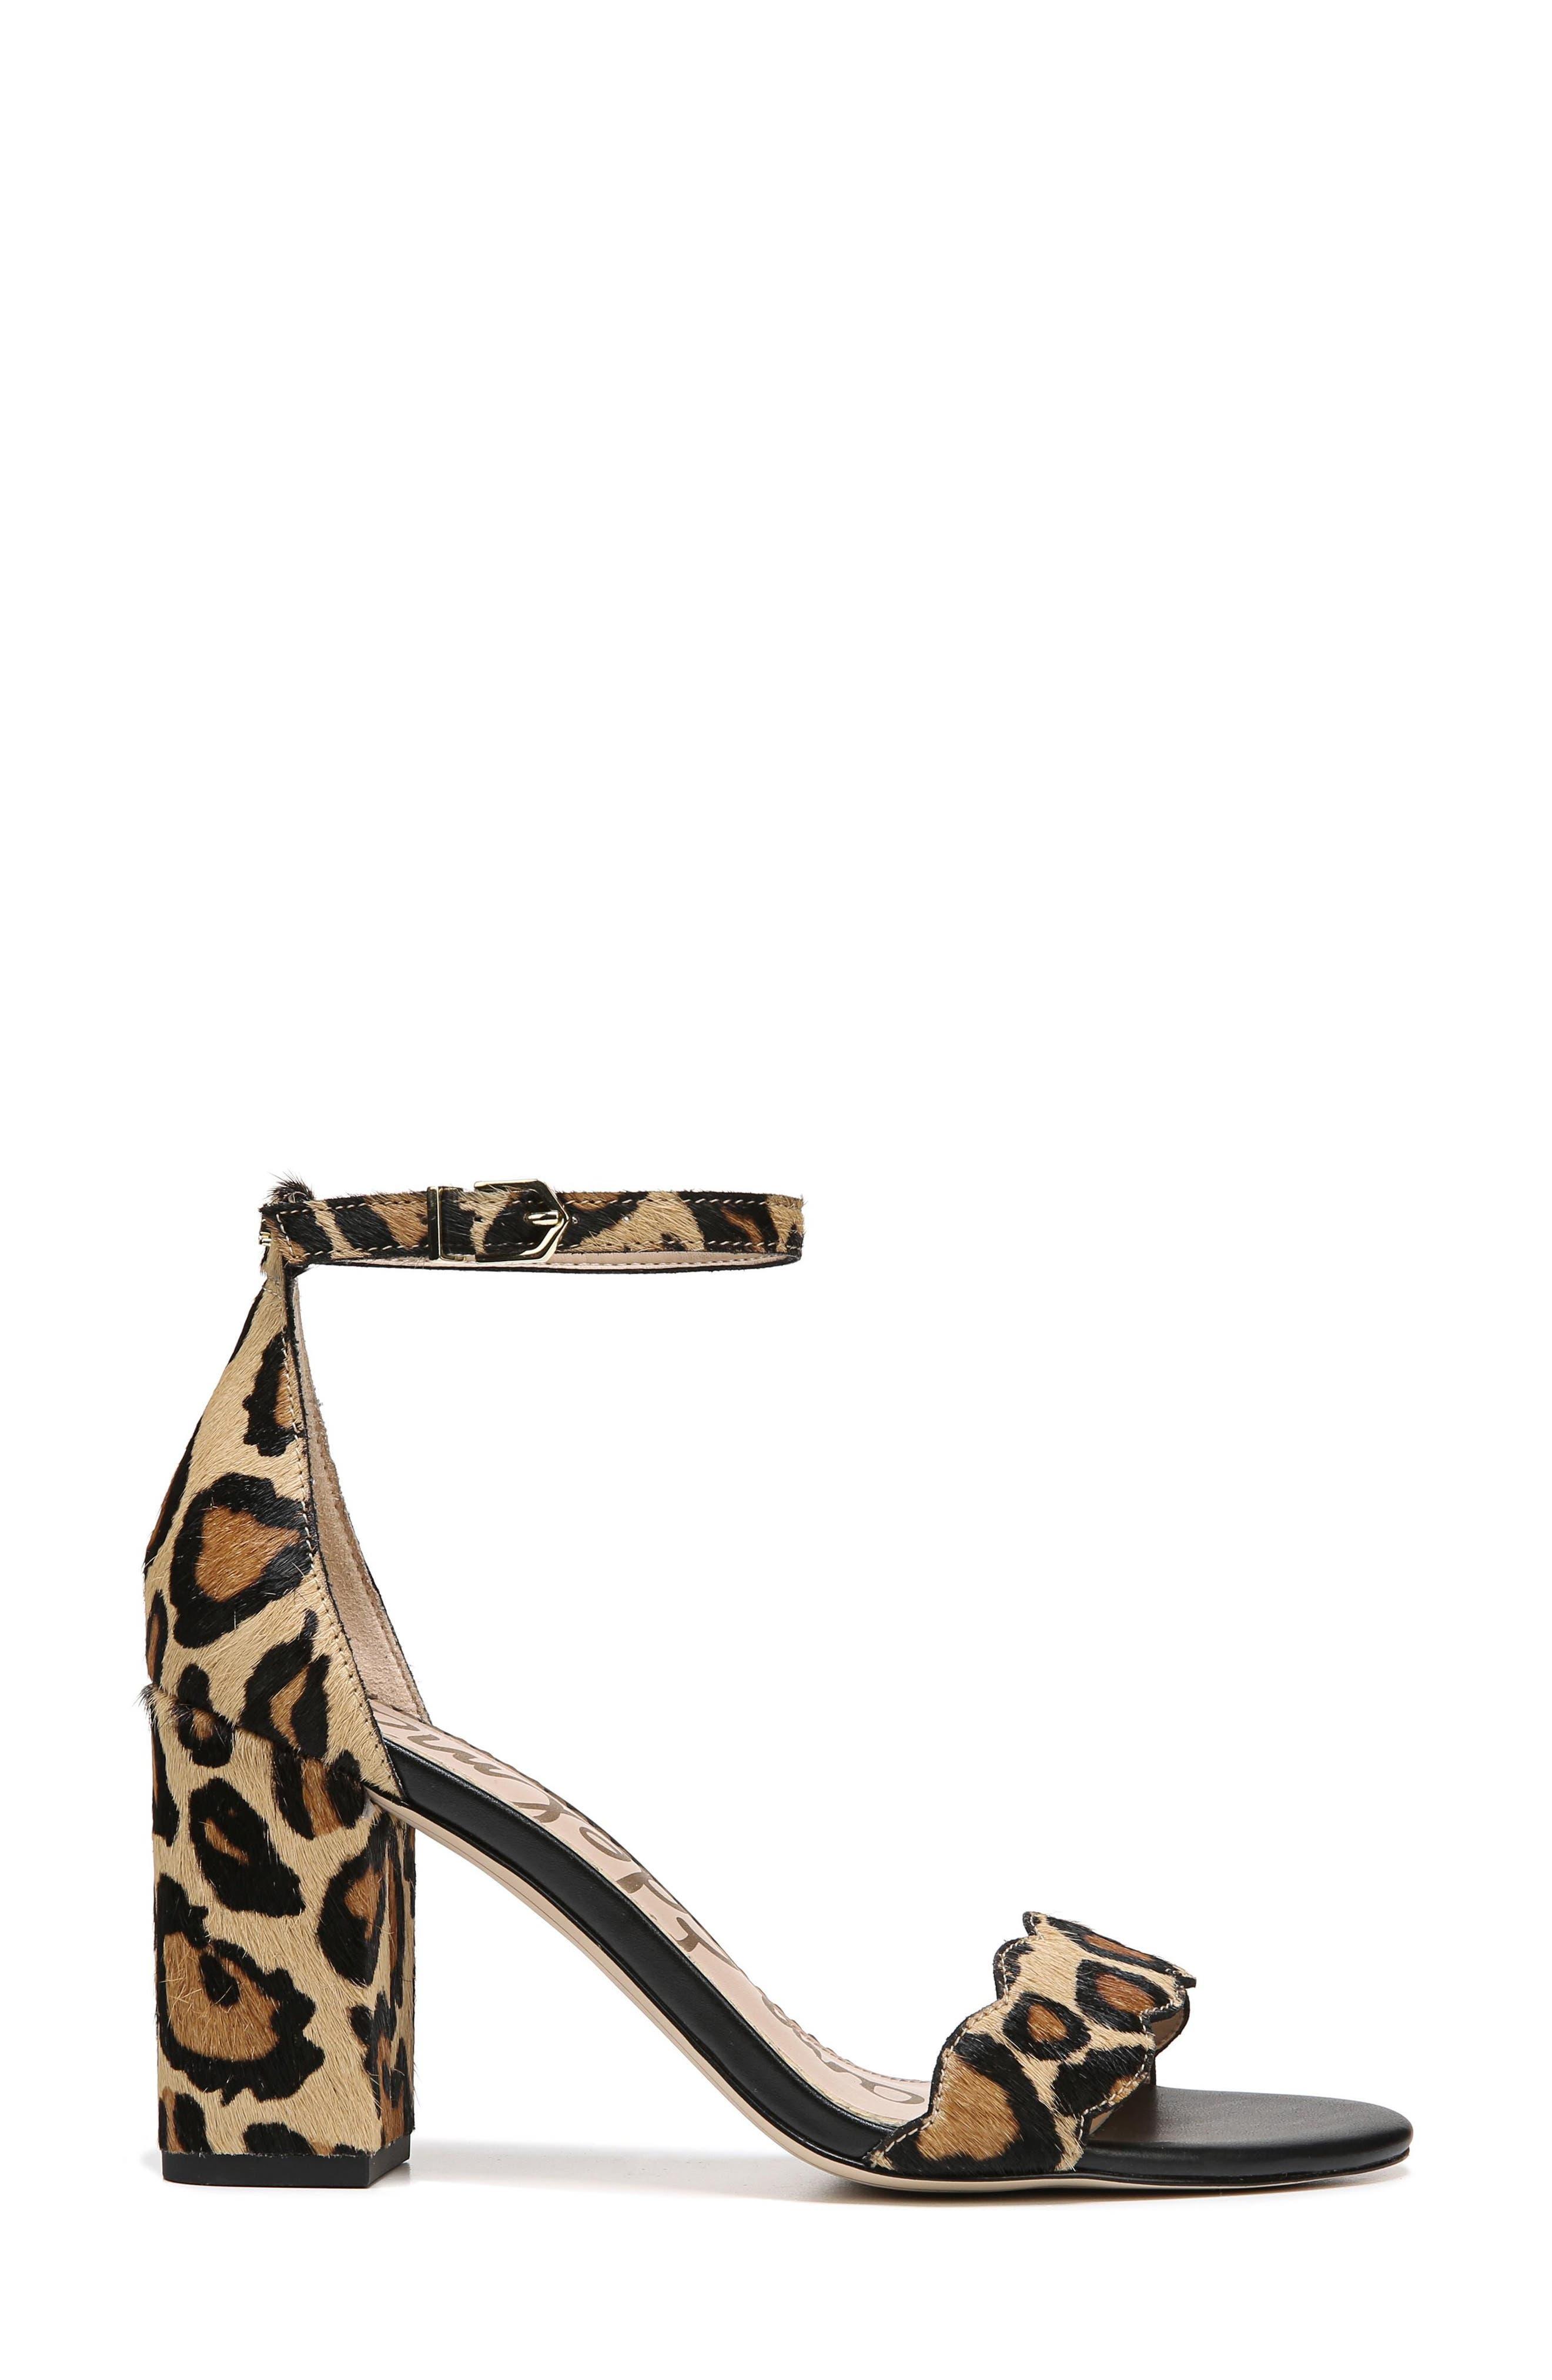 Odila Genuine Calf Hair Sandal,                             Alternate thumbnail 3, color,                             New Nude Leopard Calf Hair